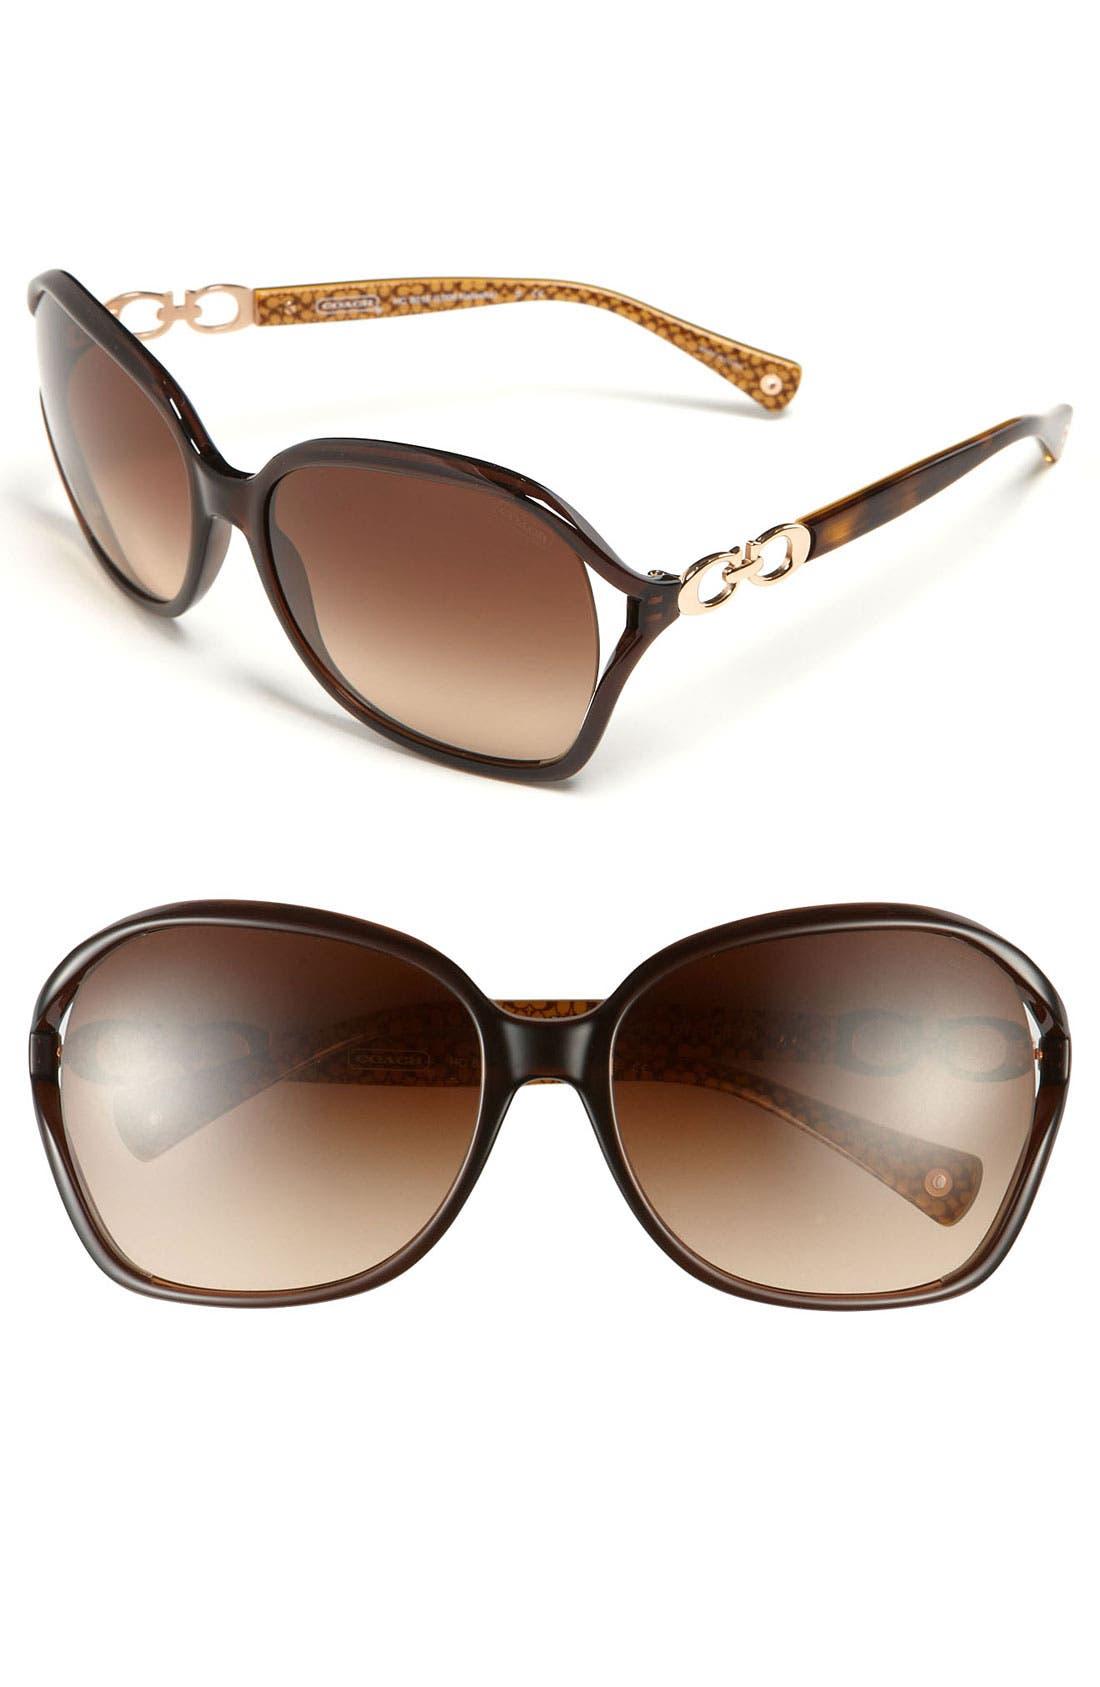 Alternate Image 1 Selected - COACH Oversized Sunglasses